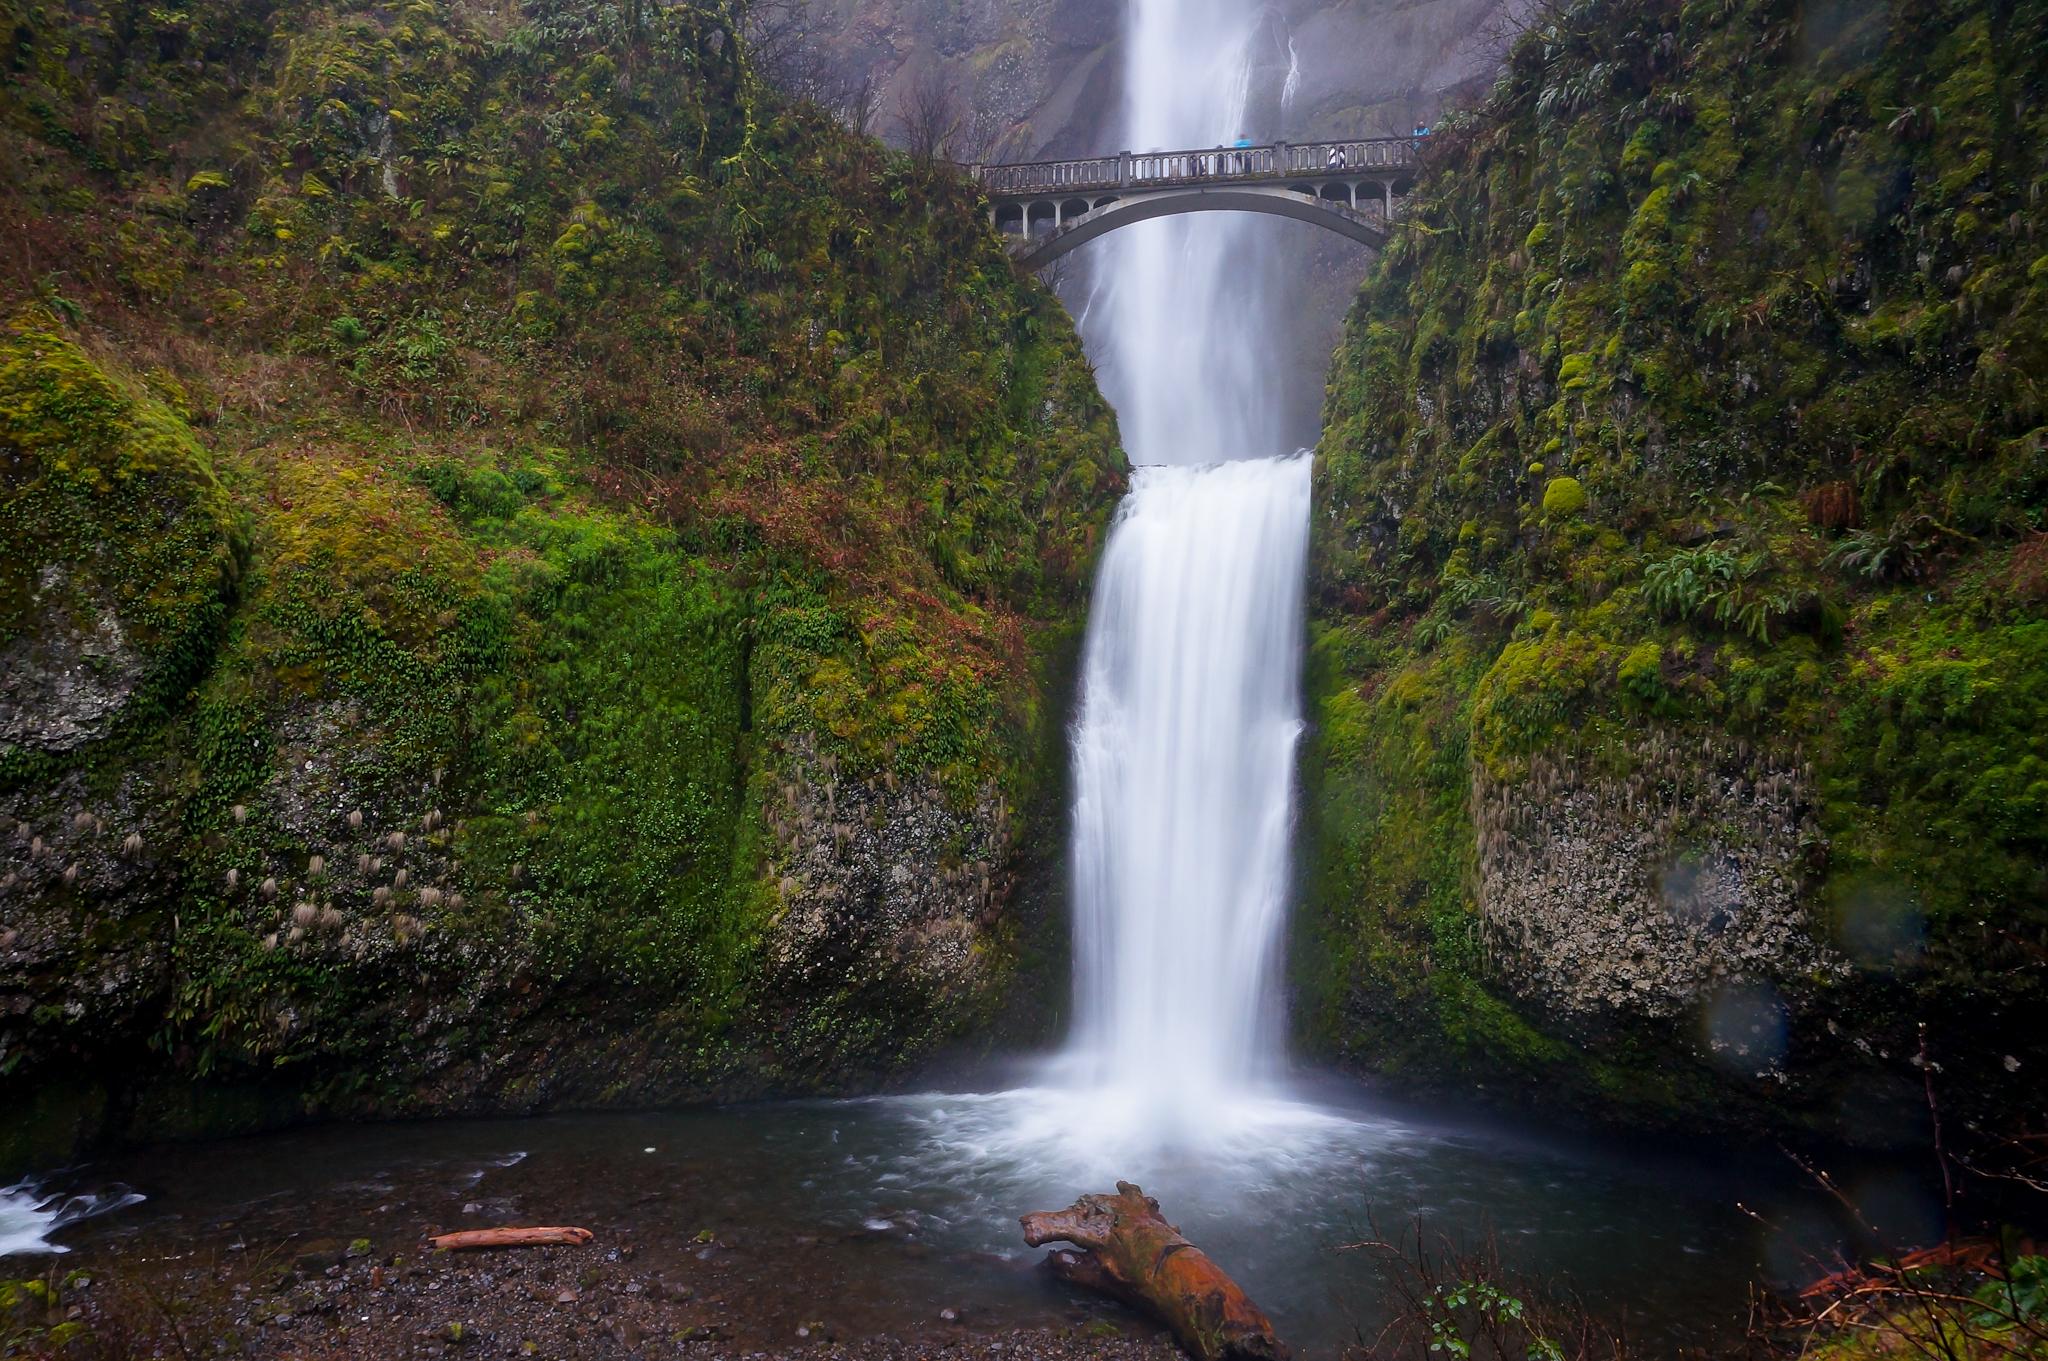 17 Gorgeous Waterfalls Across The U.S. Hiding In Plain Sight